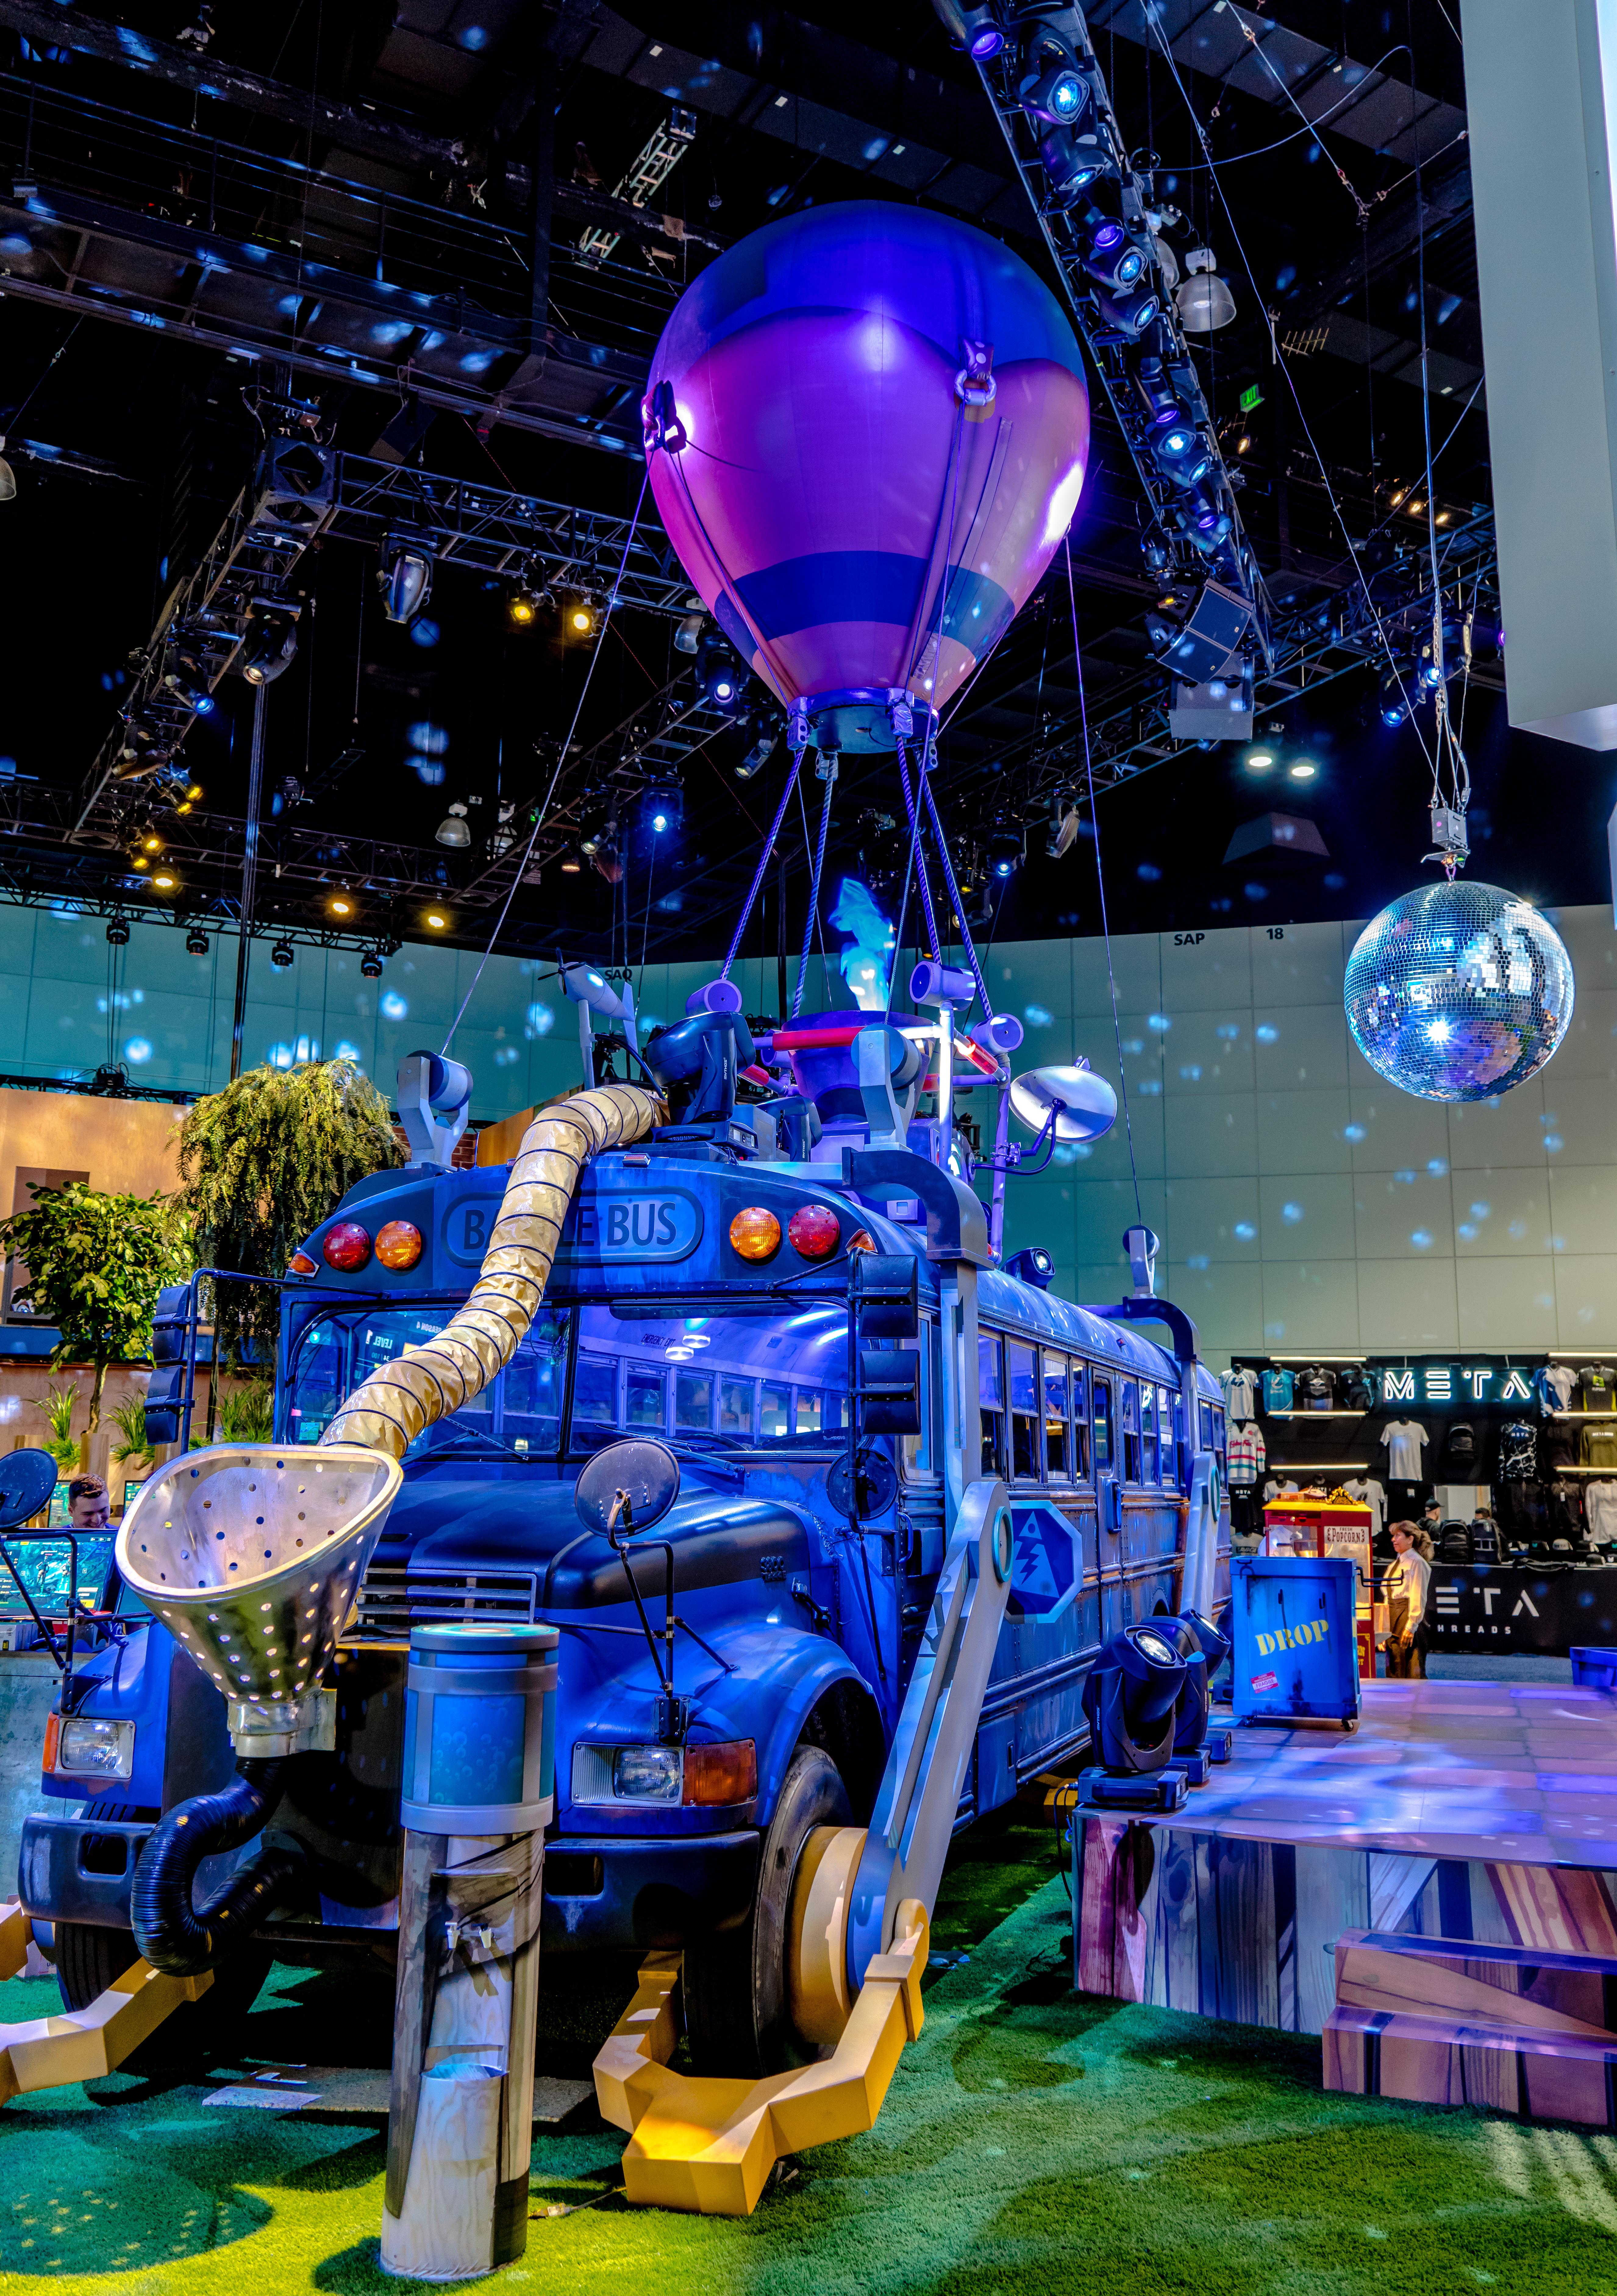 File:Fortnite at E3 2018 (42051787964) jpg - Wikimedia Commons